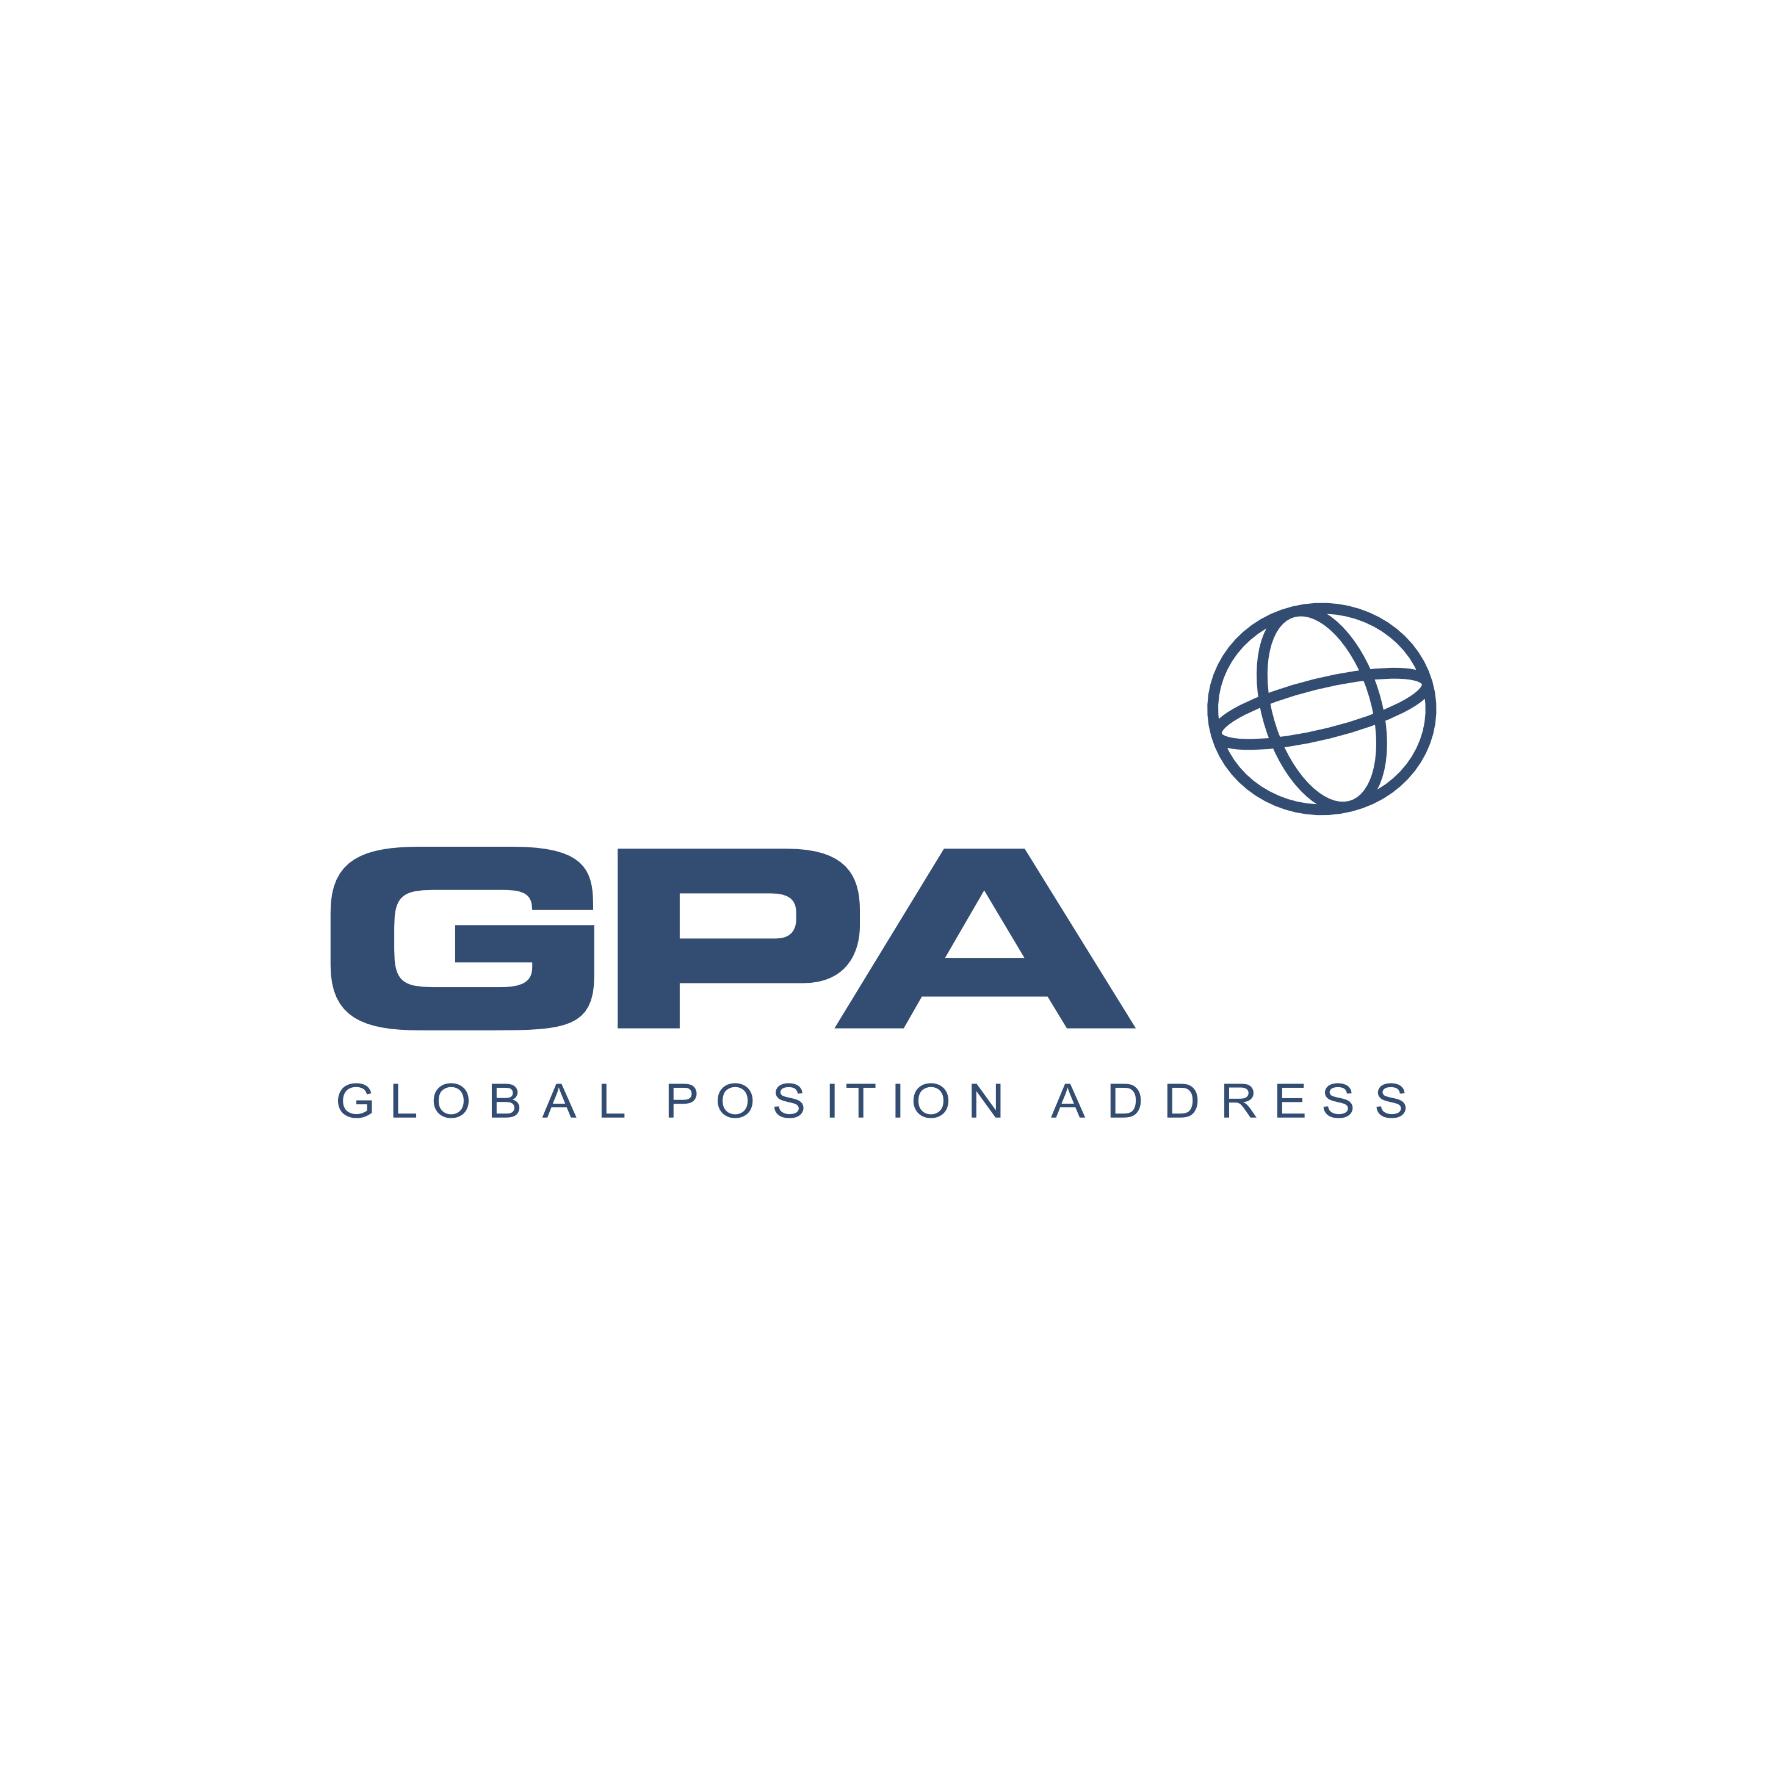 Global Position Address